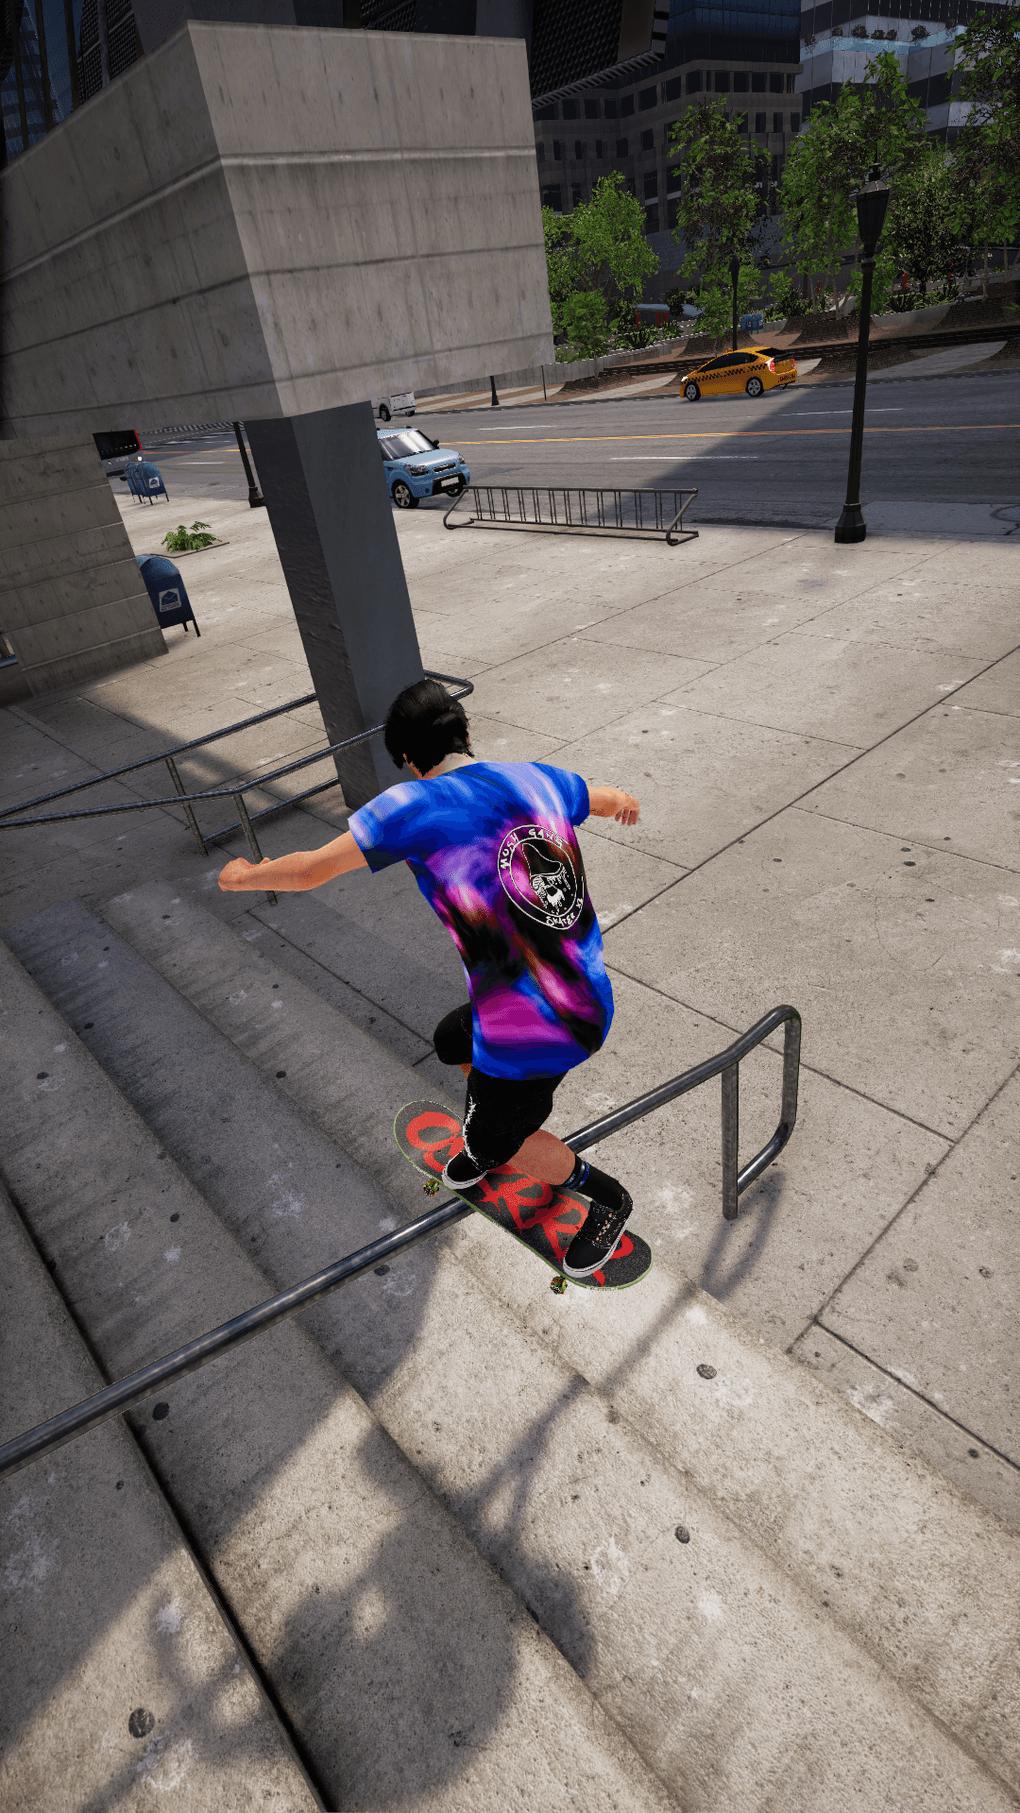 skater_xl_screenshot_2021.01.04_-_12.06.07.34.png